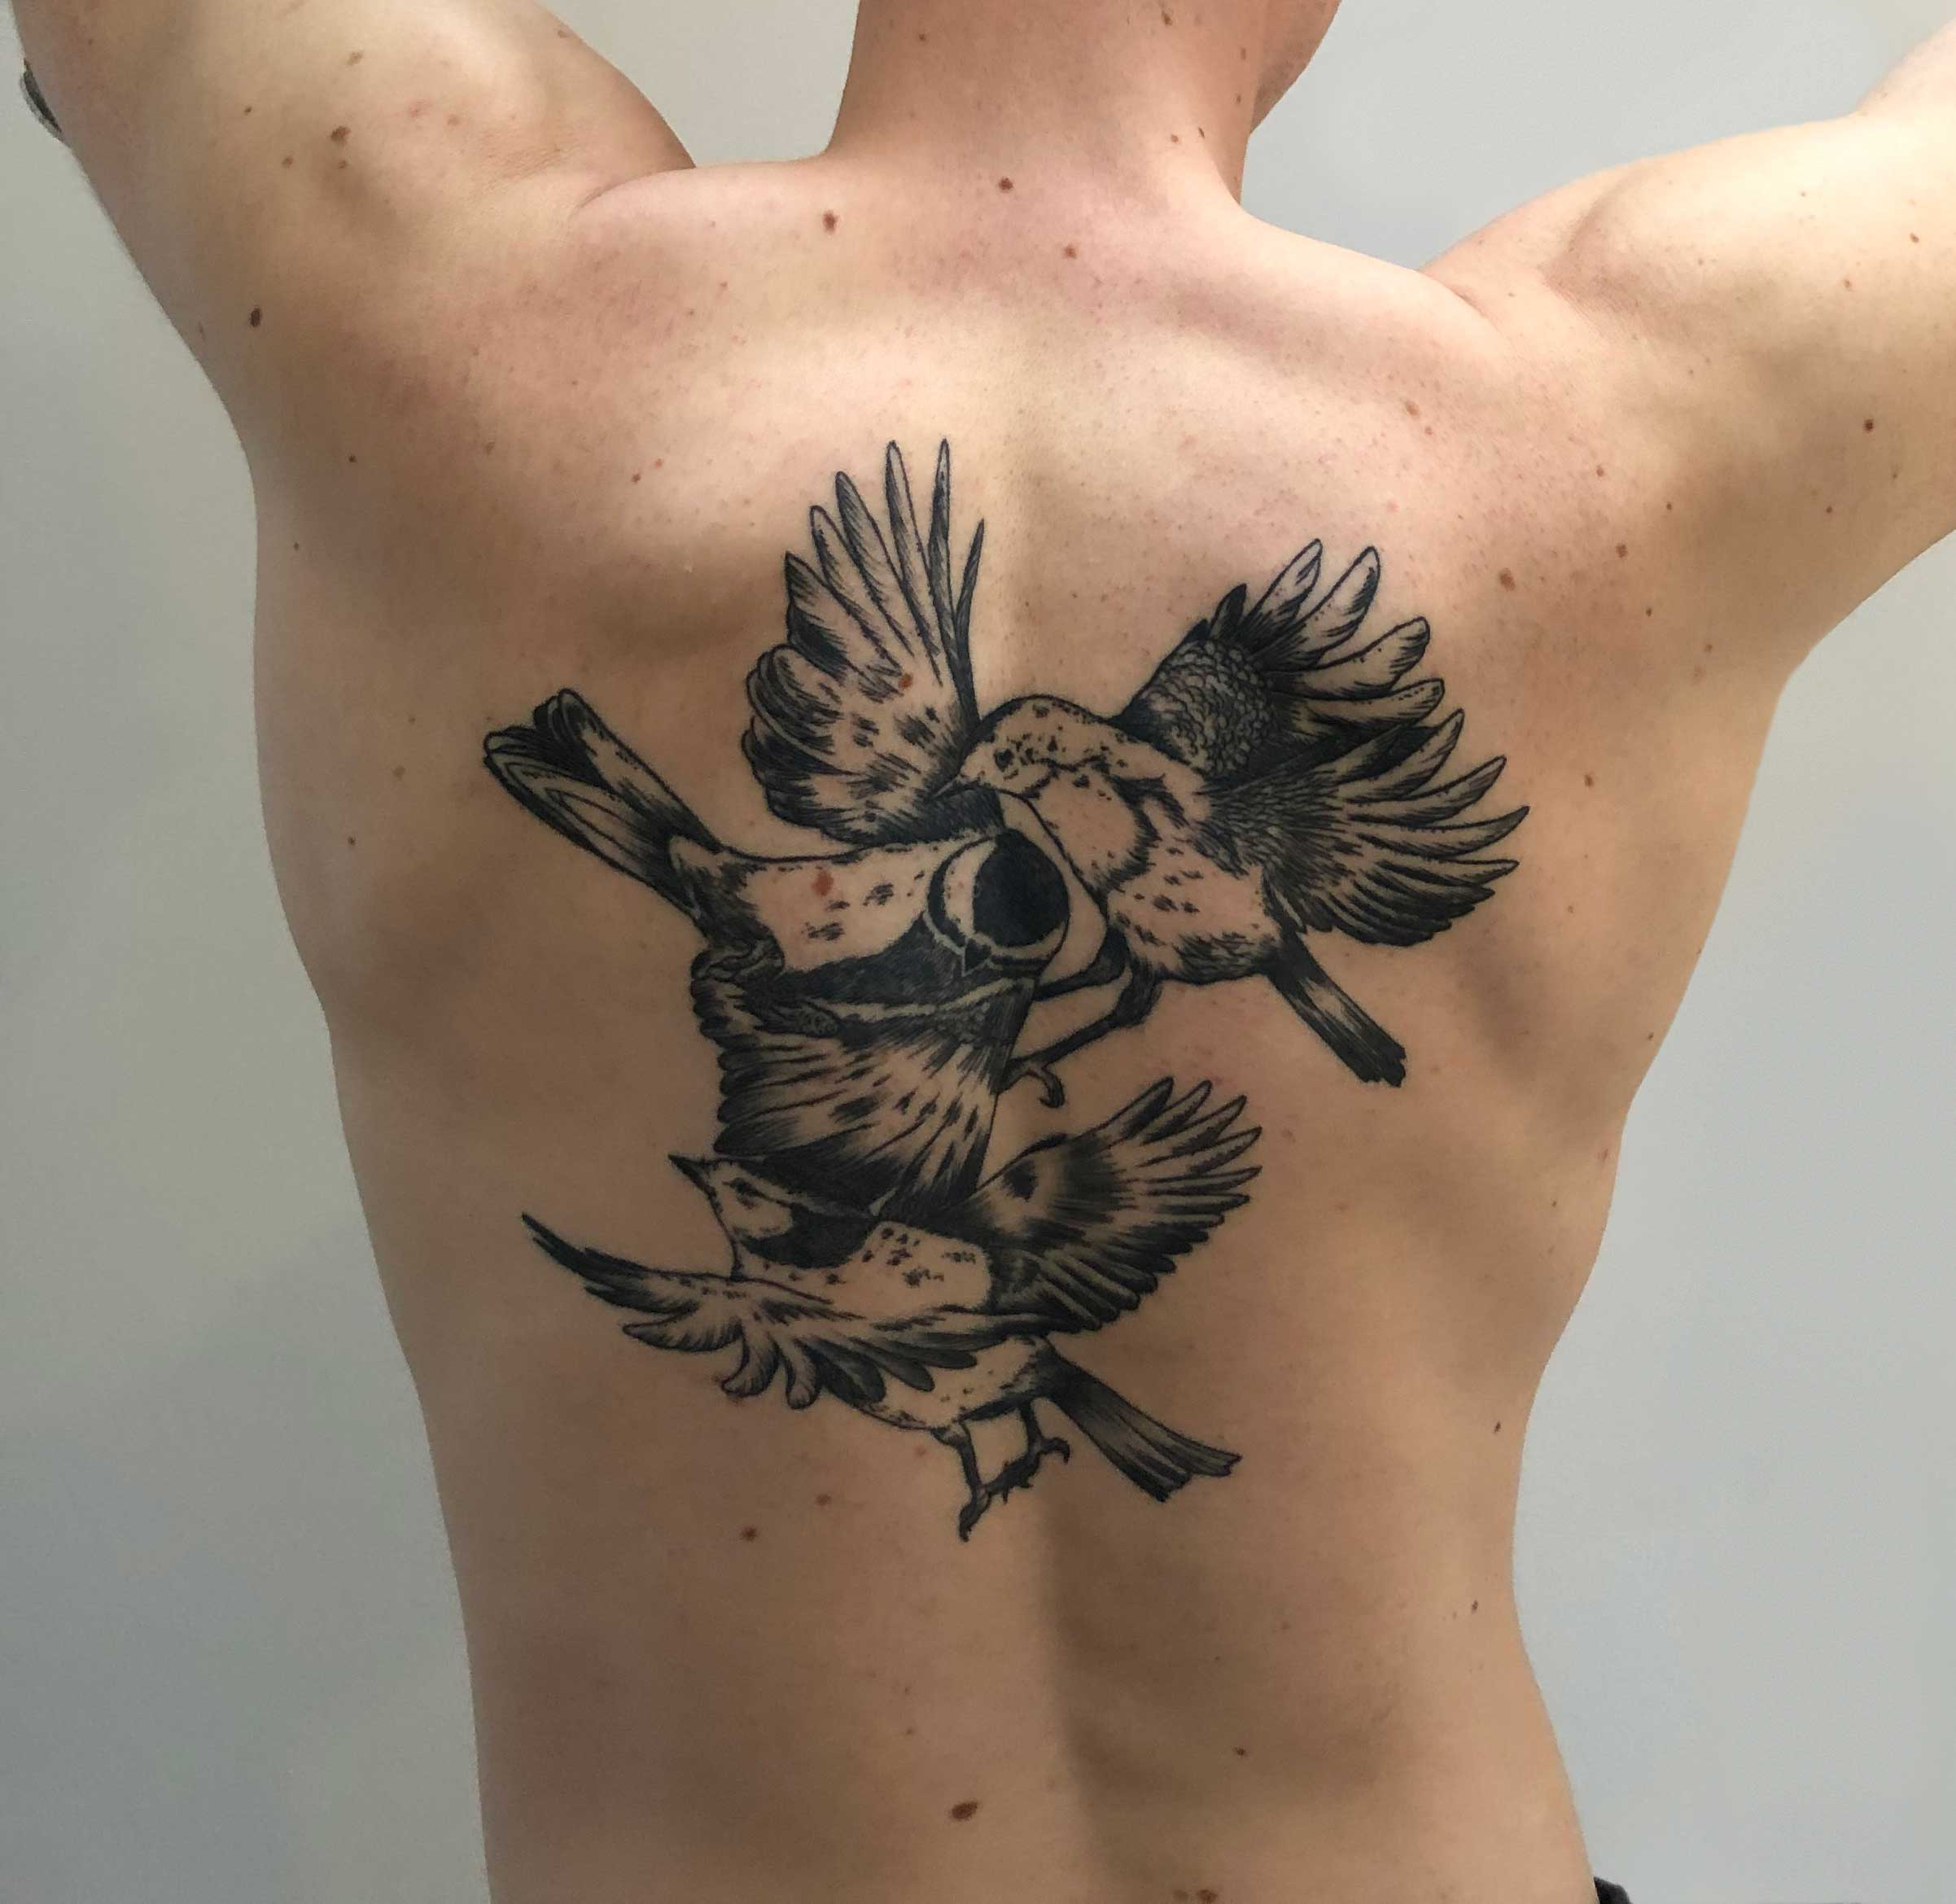 Florian Hirnhack Back Tattoo of Three Birds